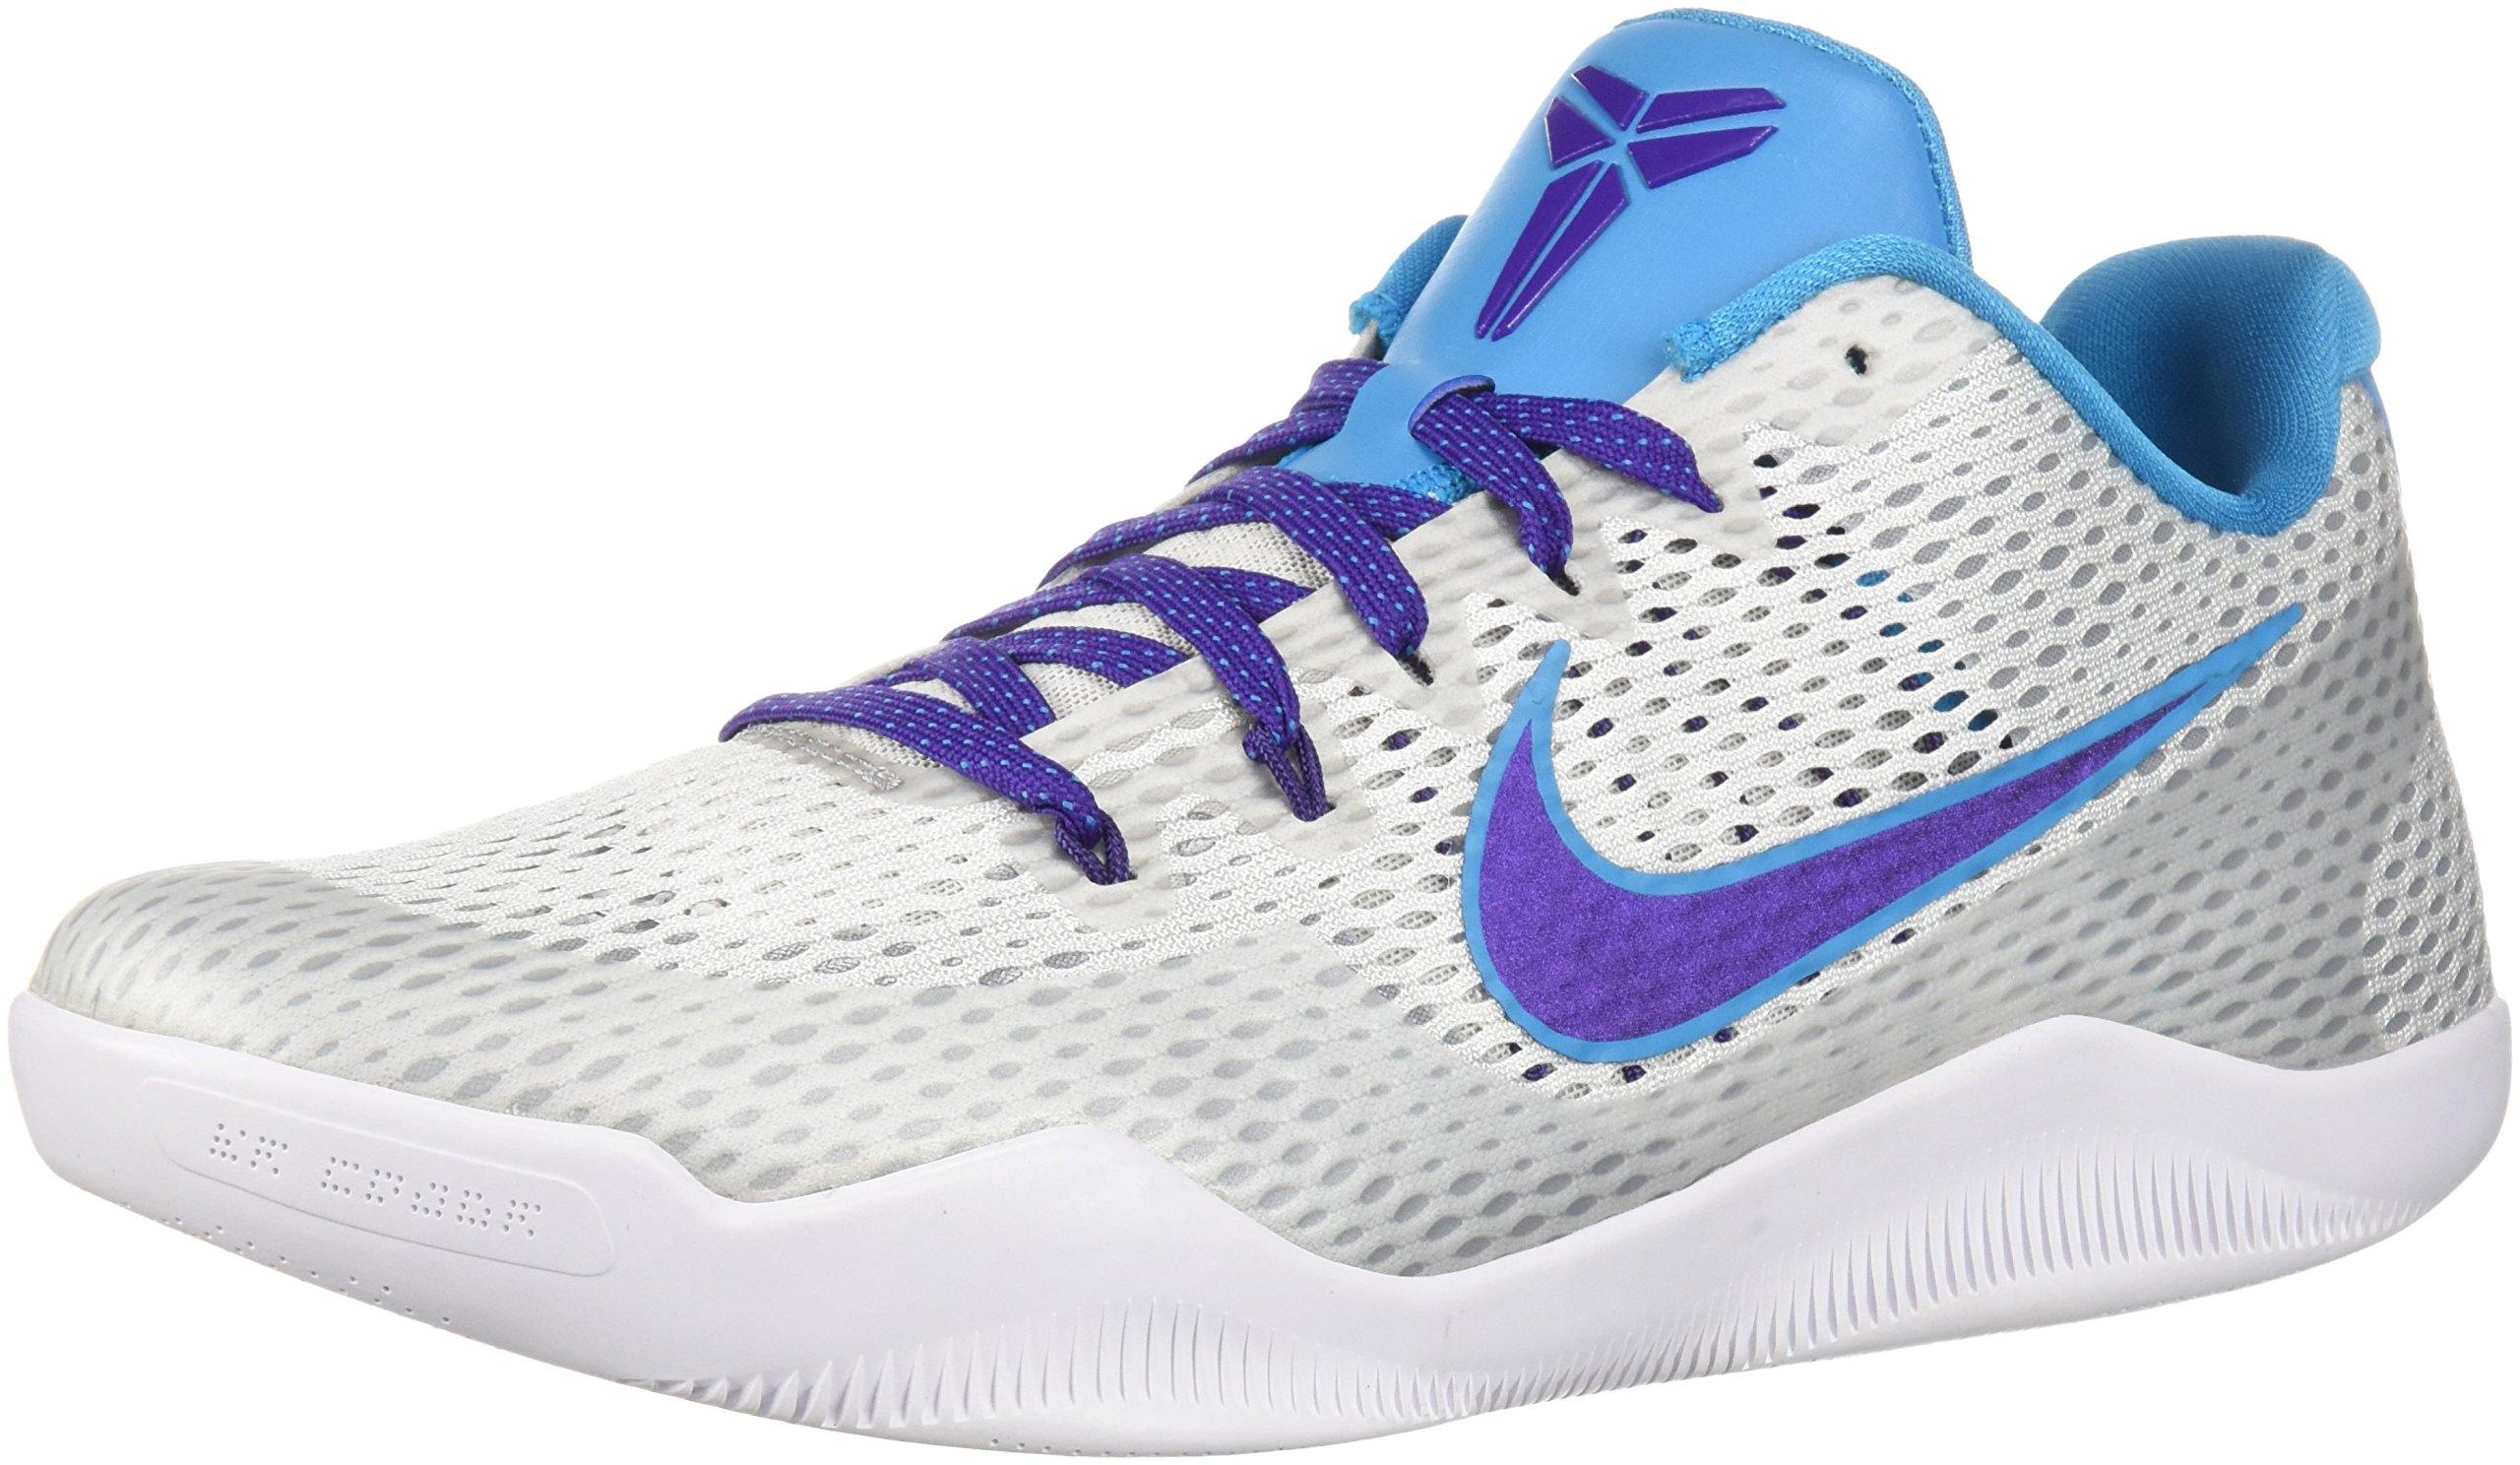 6180bc873bab Galleon - Nike Men s Kobe Xi Basketball Shoes (11.5 D(M) US